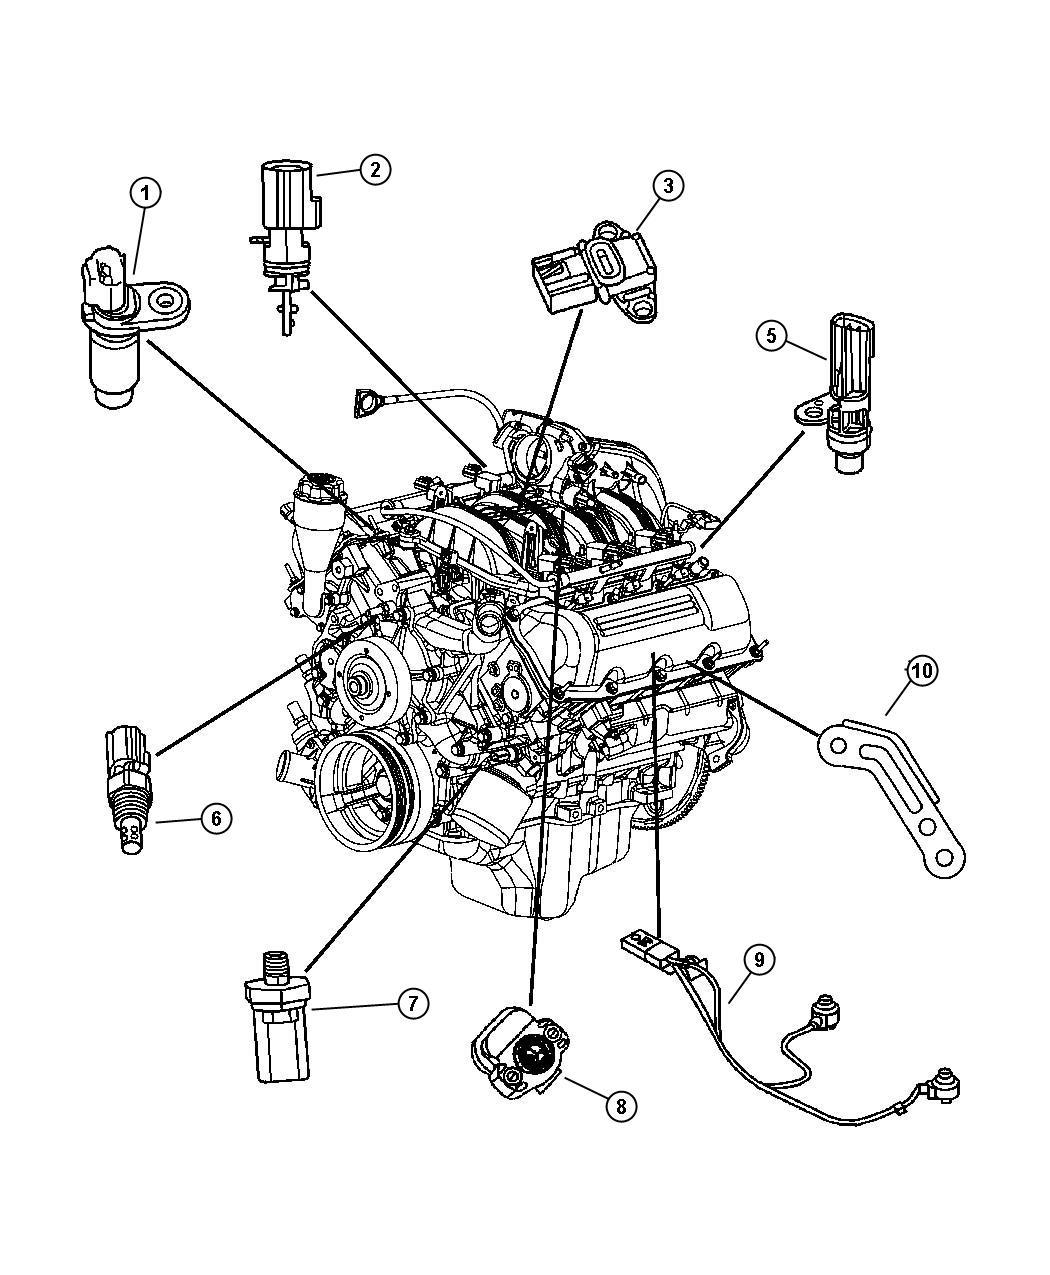 Dodge Durango Sensor, sensor kit. Throttle position